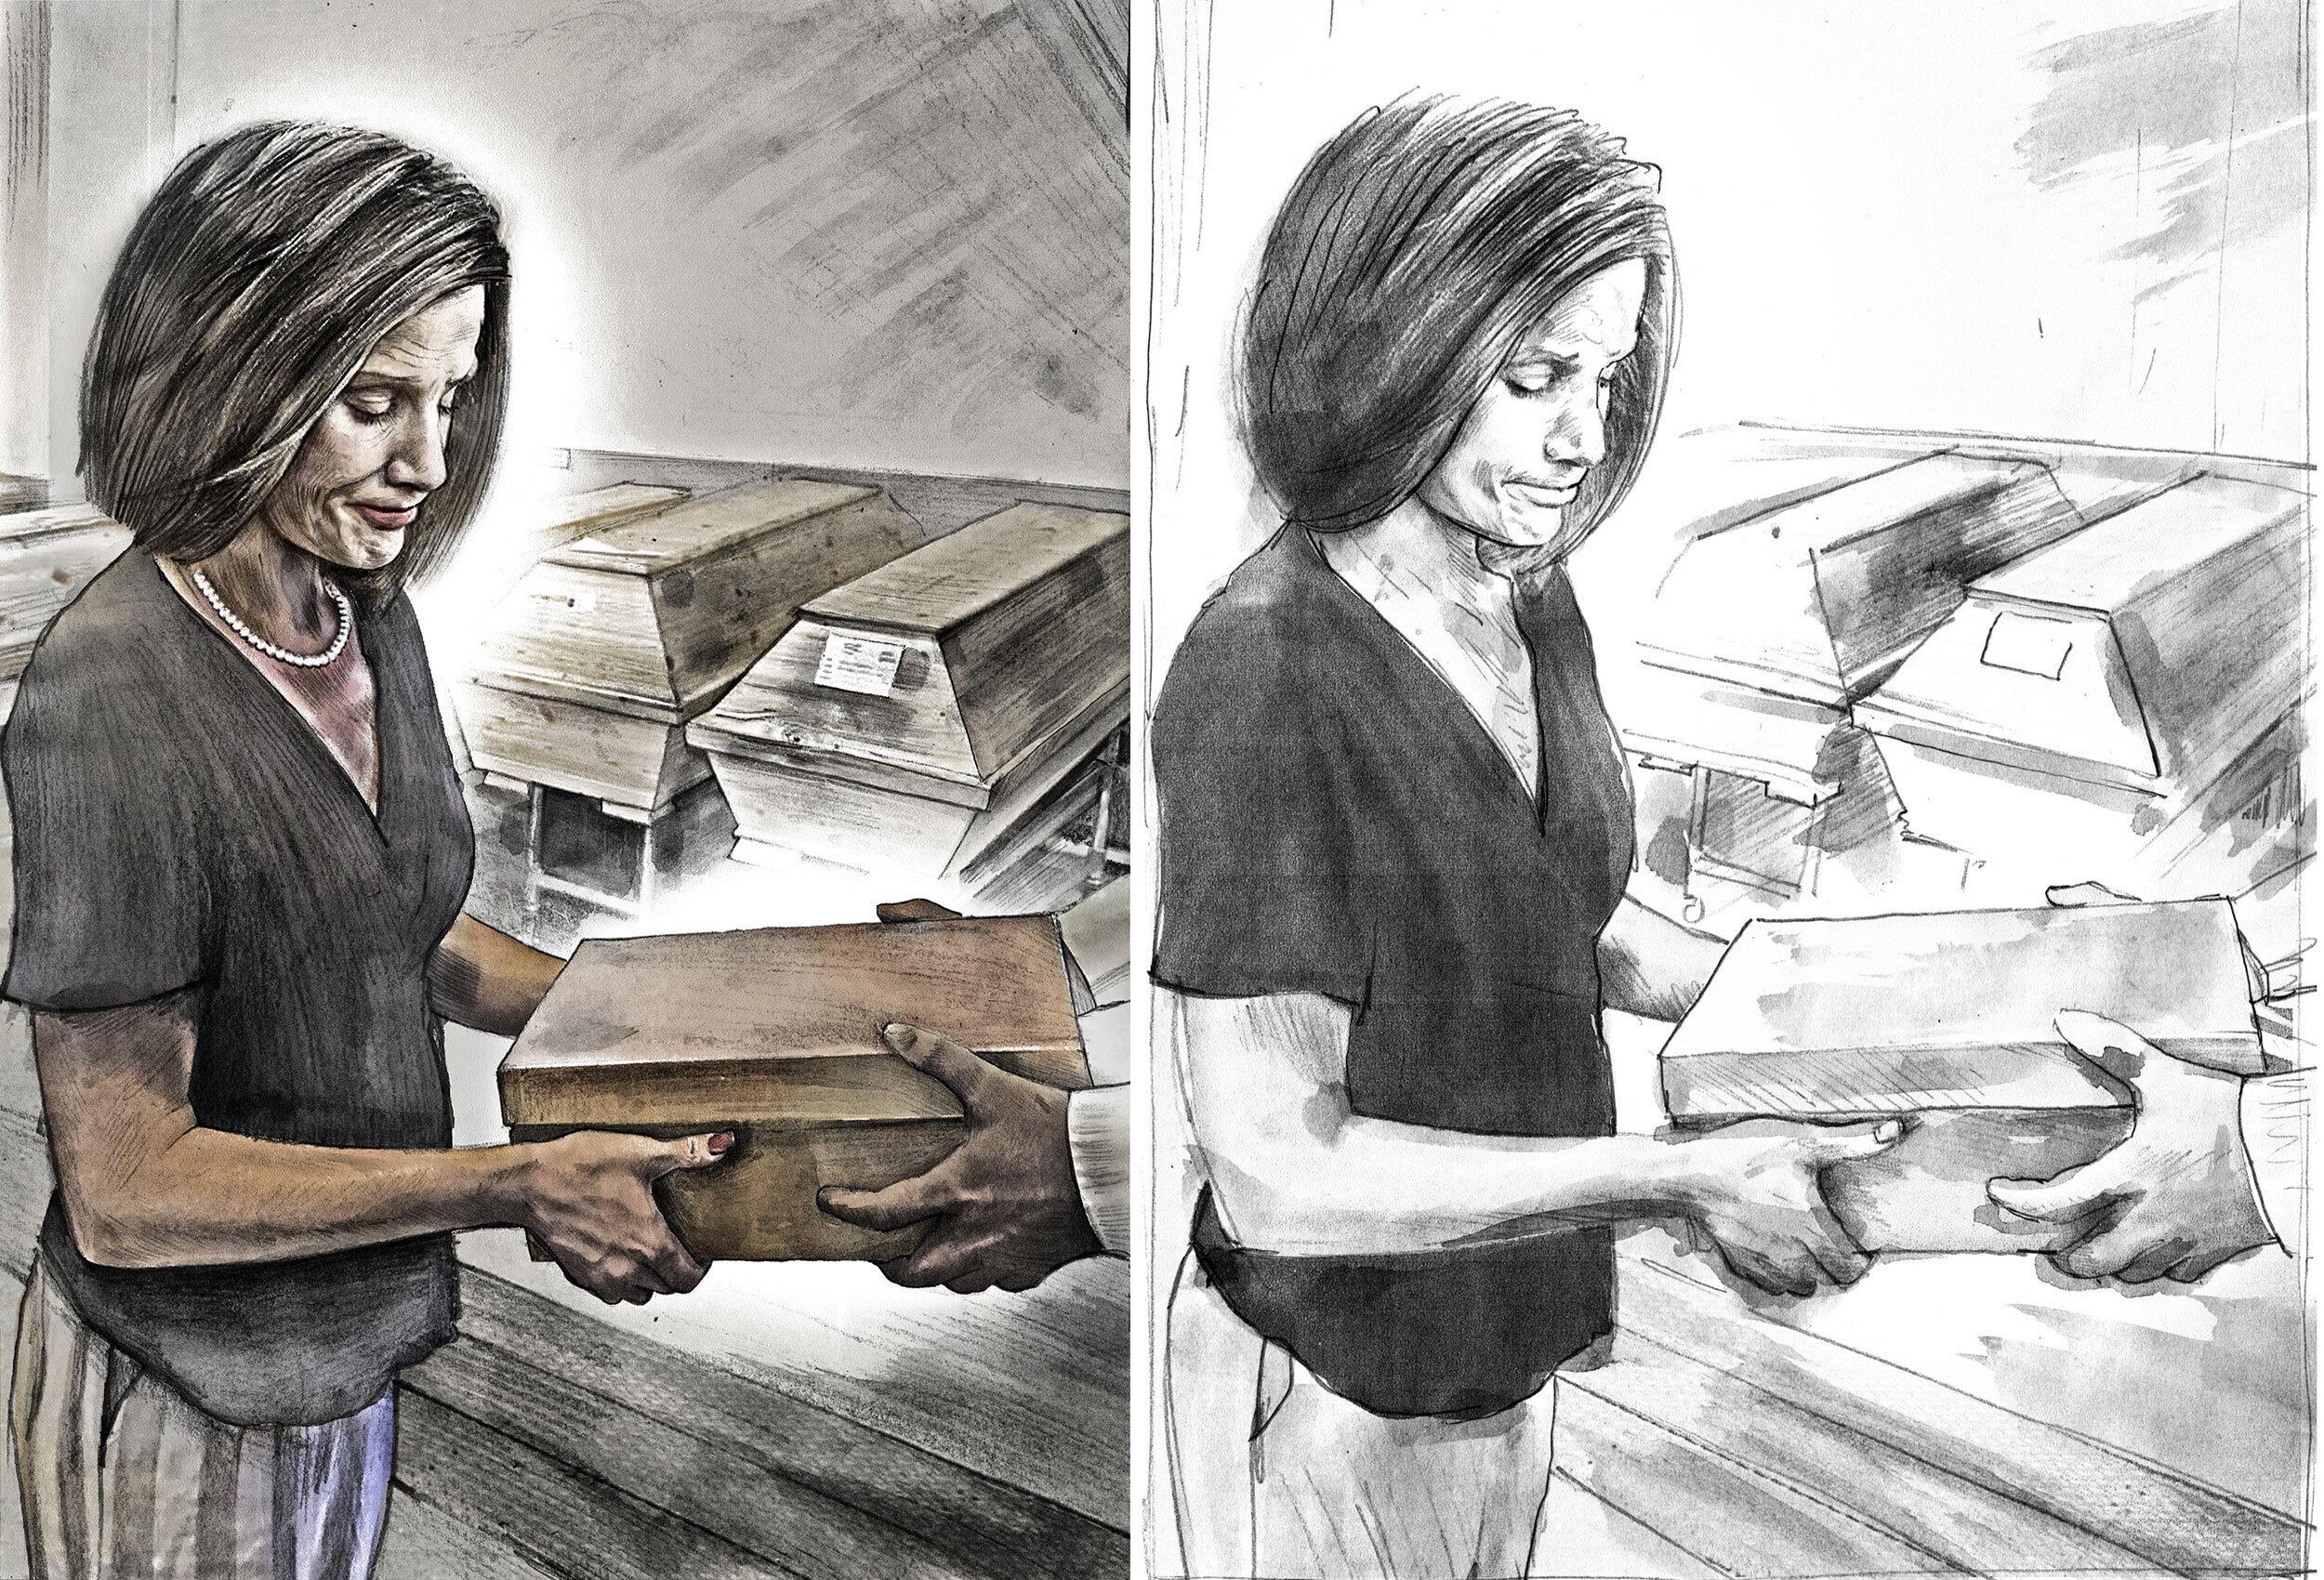 Sad woman coffin illustration - Kornel Illustration | Kornel Stadler portfolio